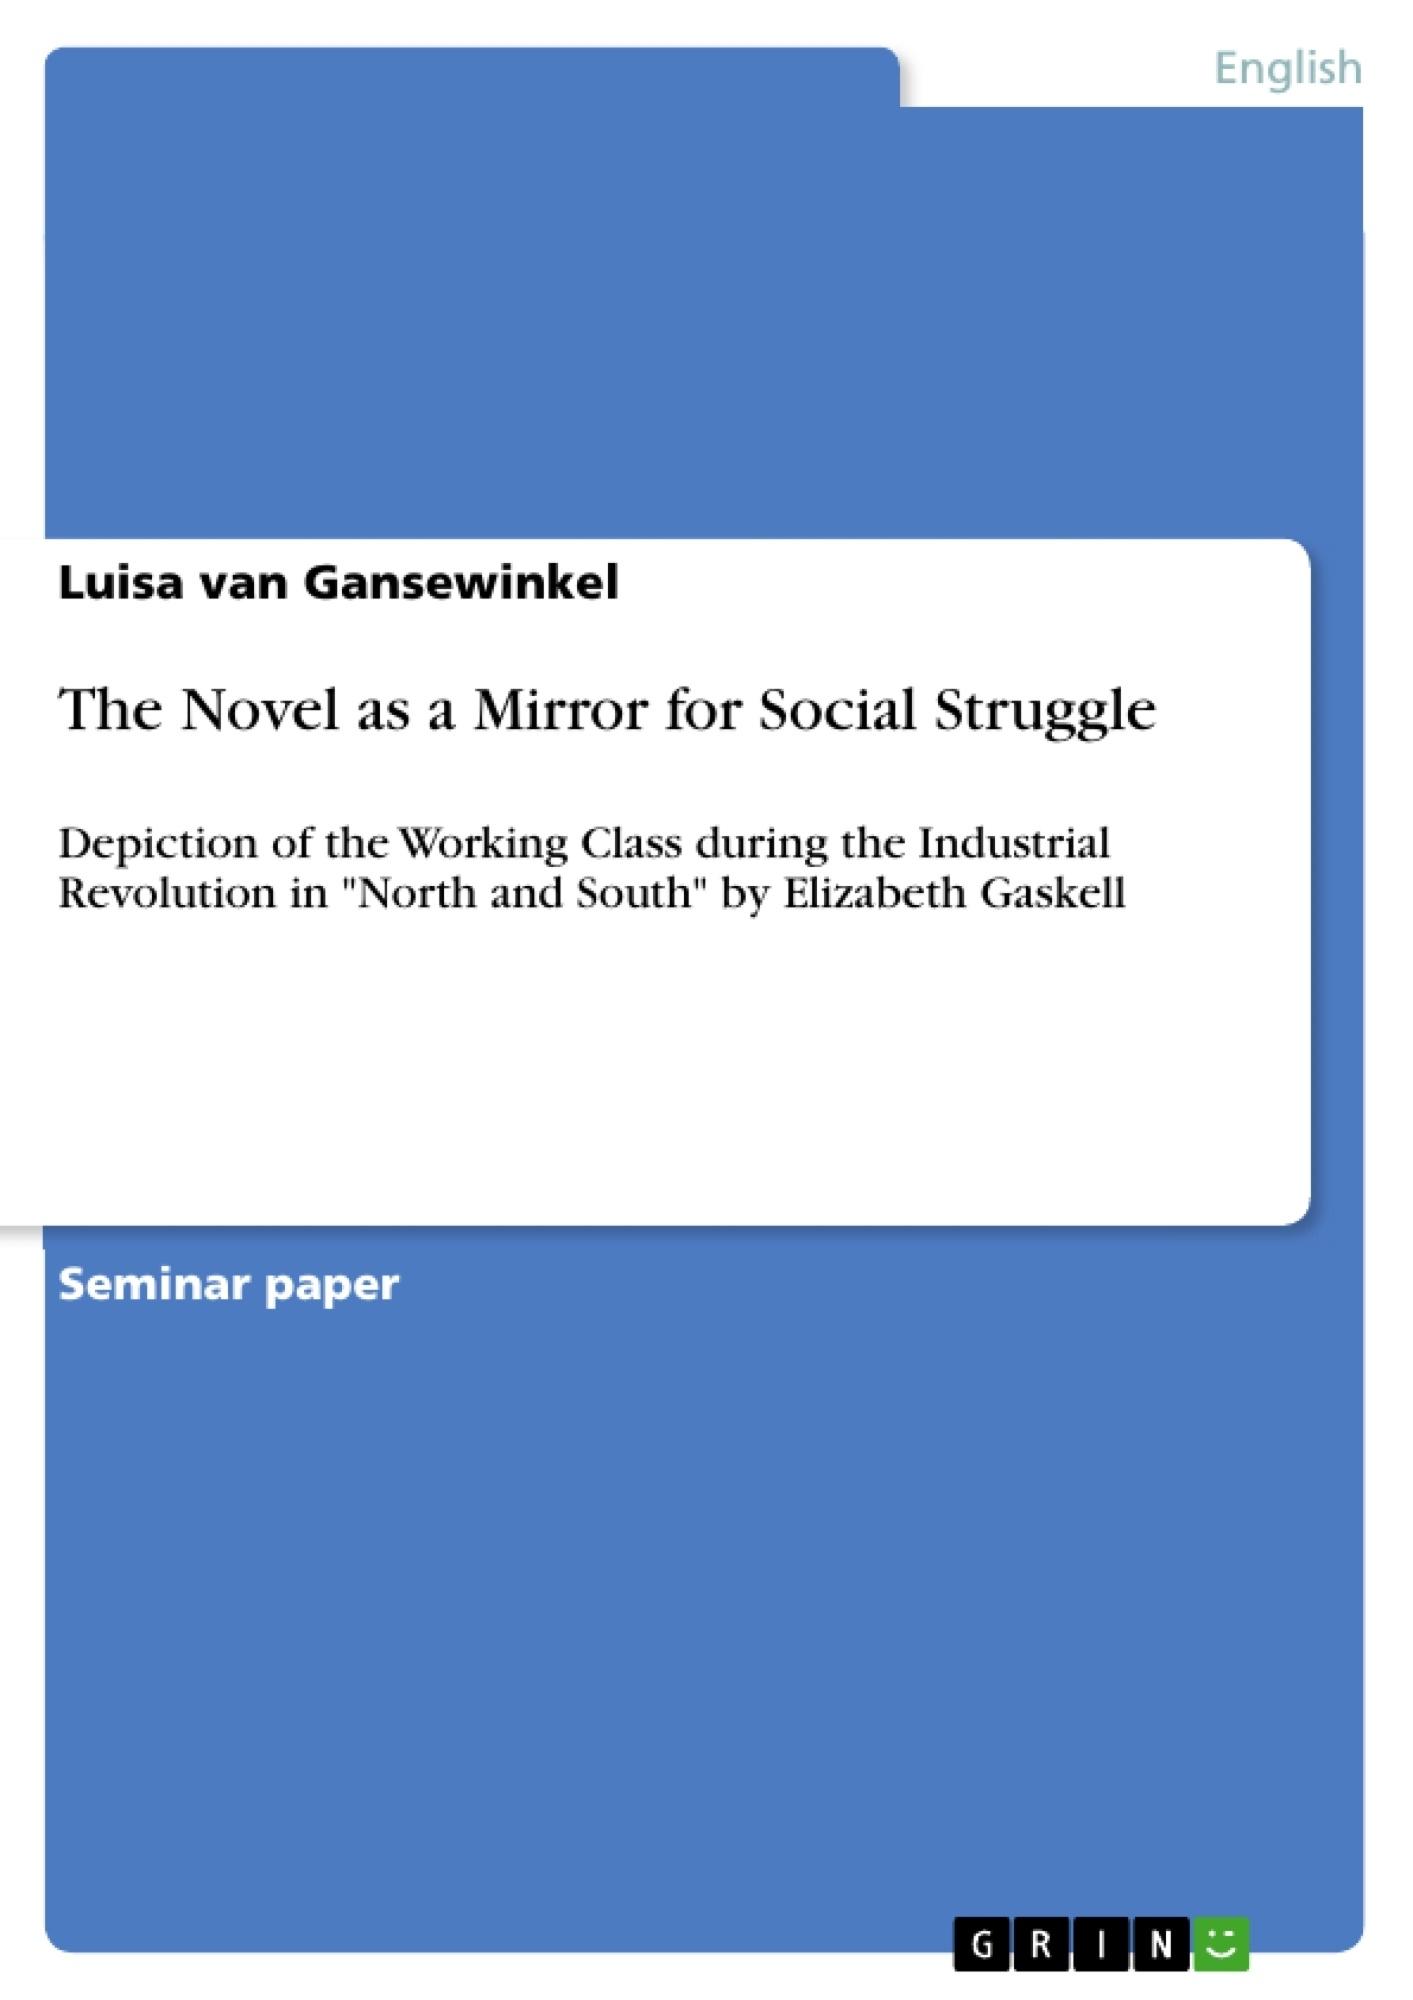 Title: The Novel as a Mirror for Social Struggle